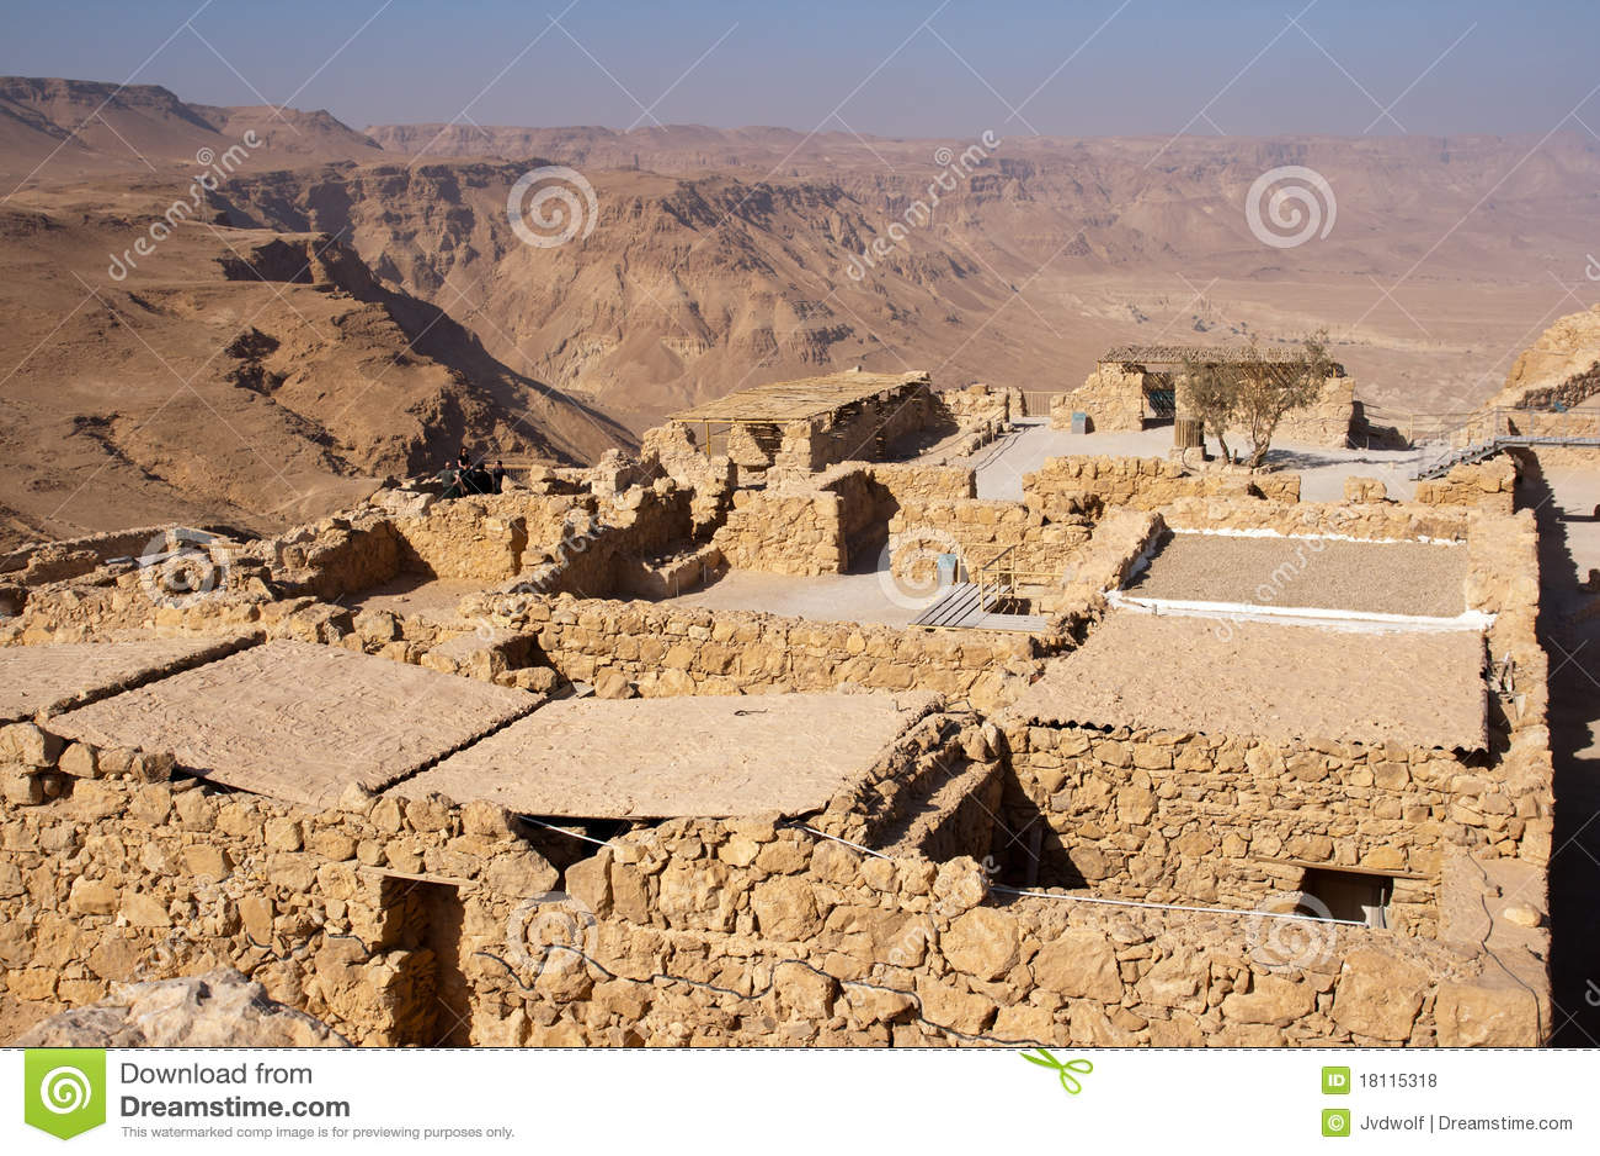 Archaeology in Israel: Masada Desert Fortress